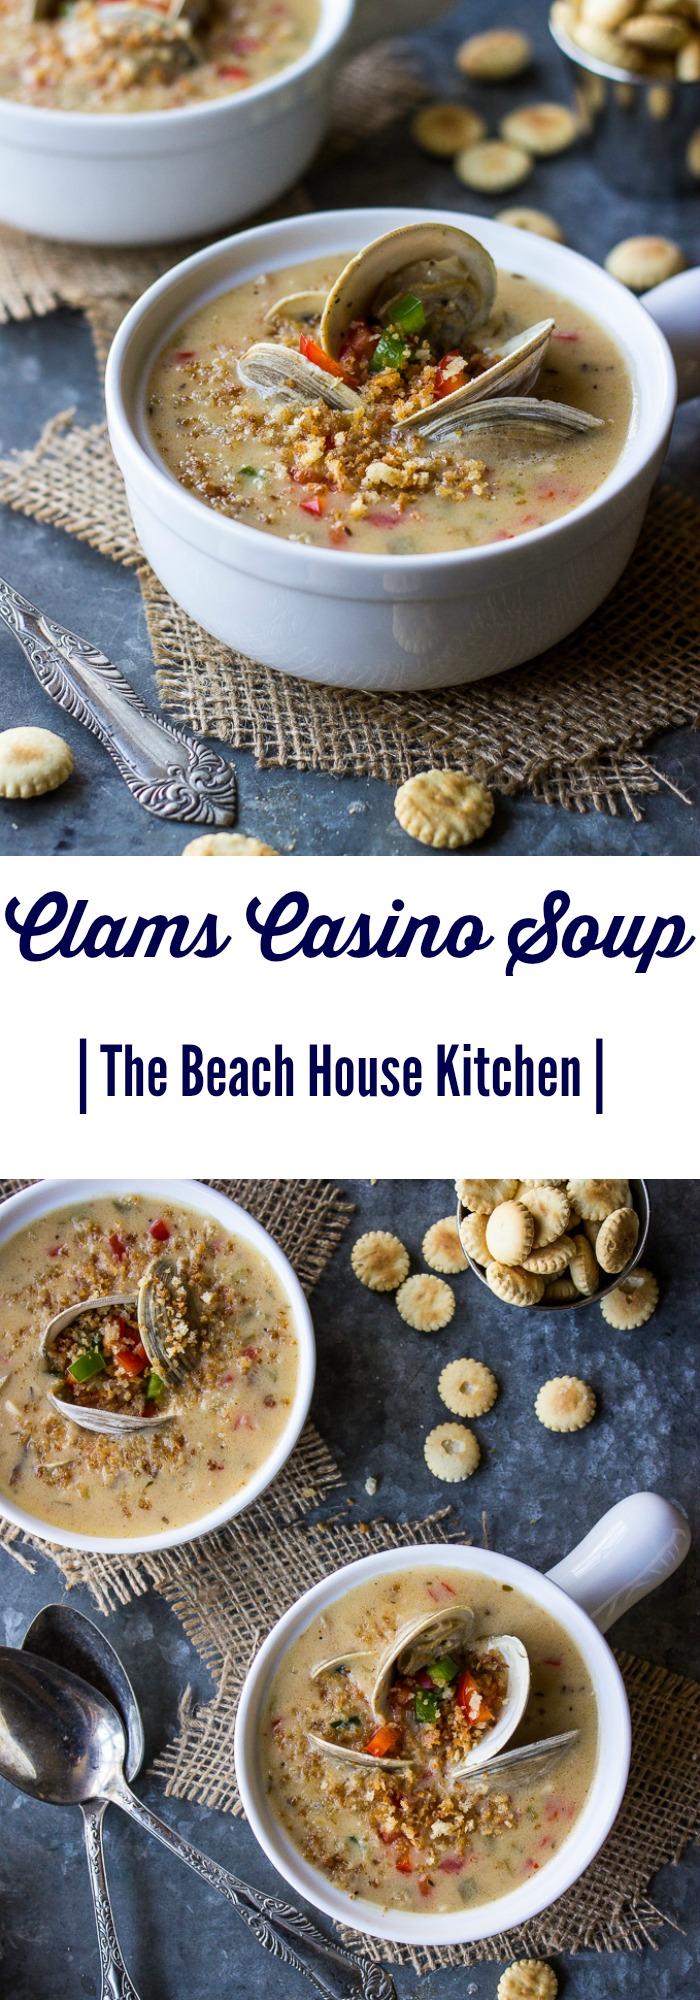 Clams Casino Soup